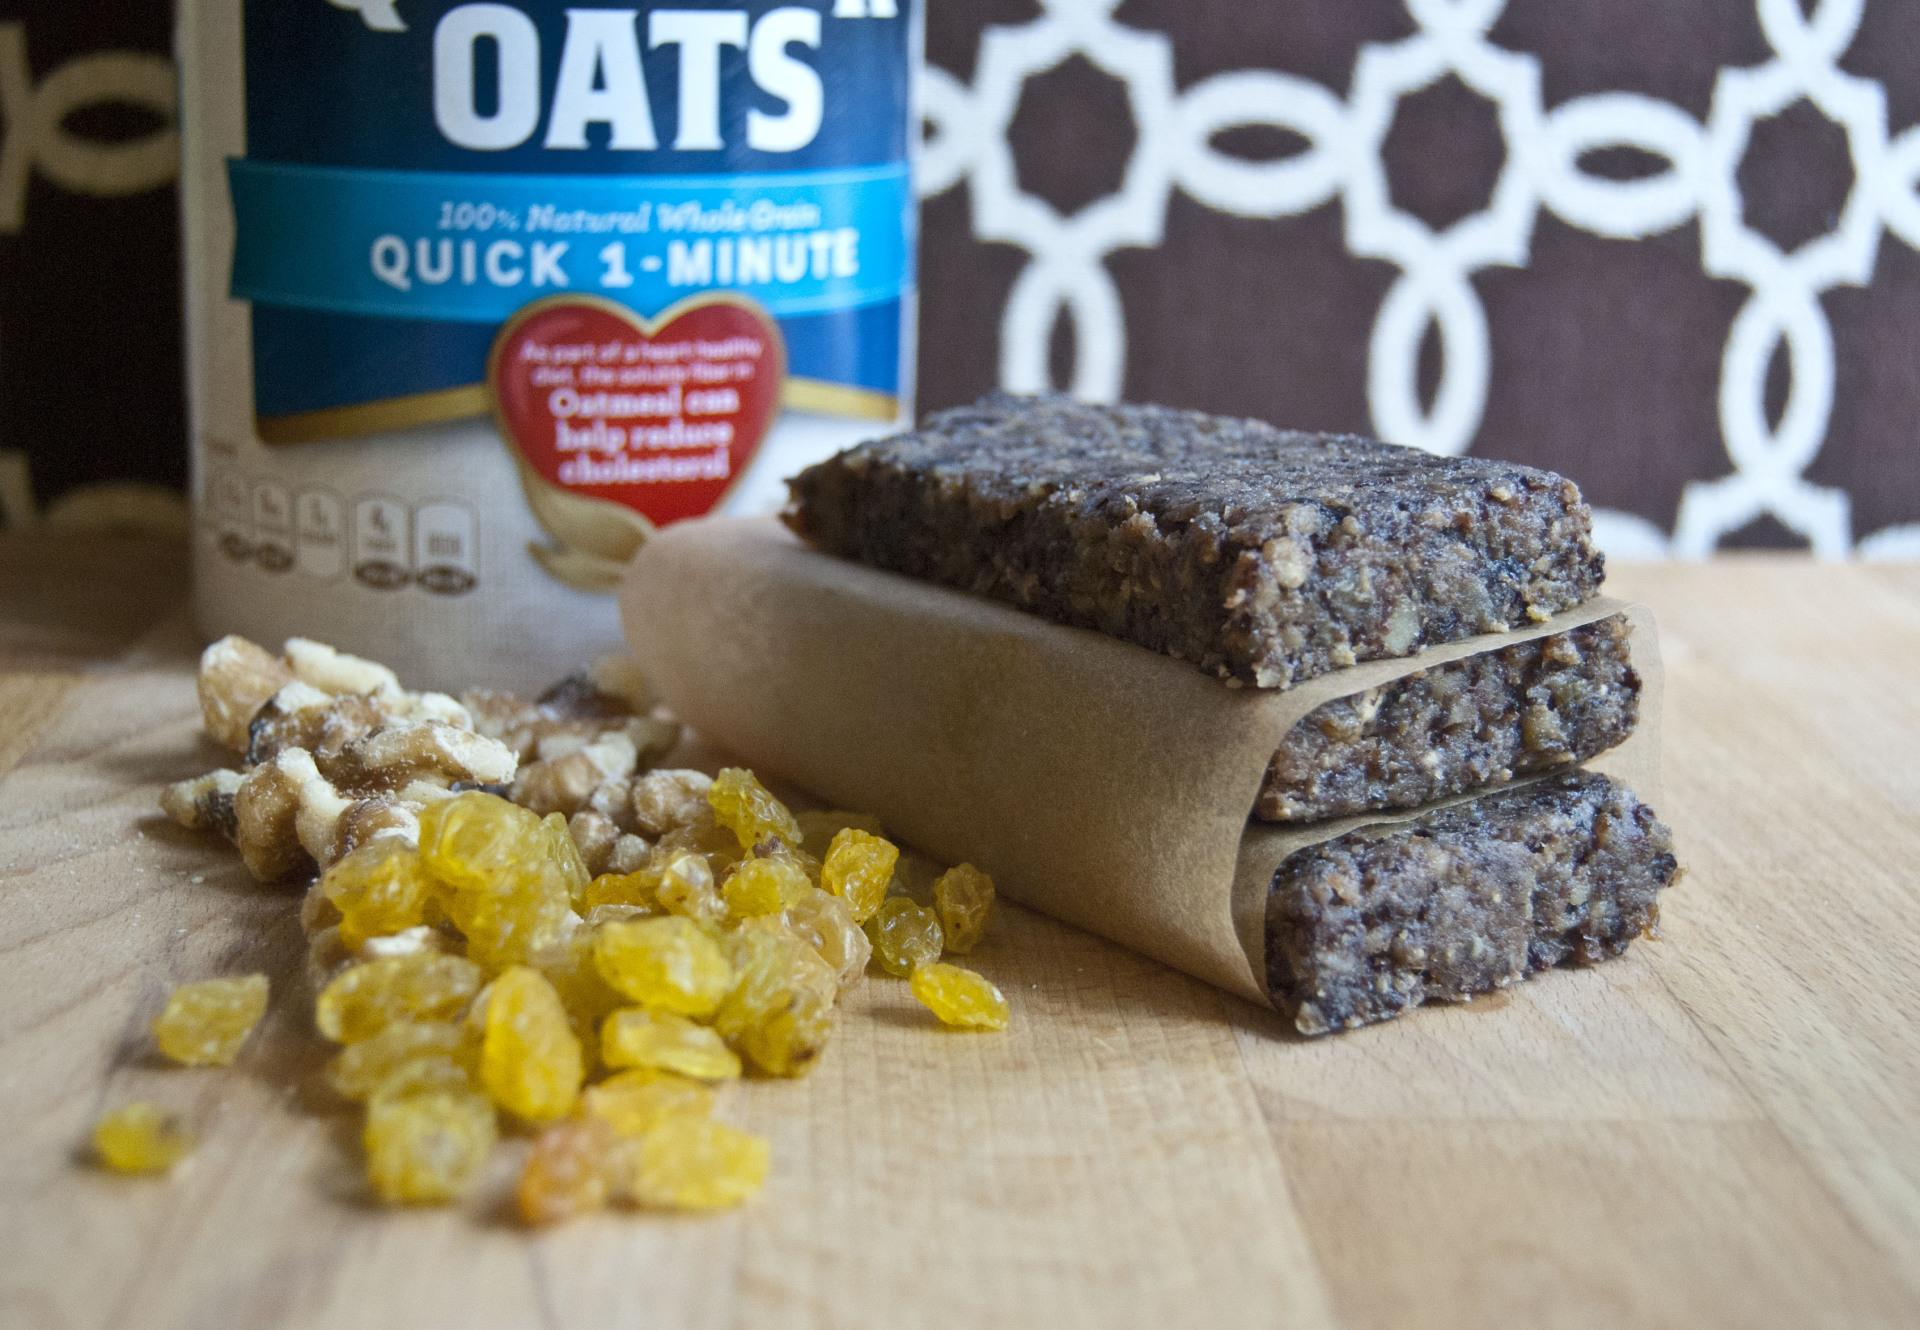 Oatmeal Cookie Energy Bars